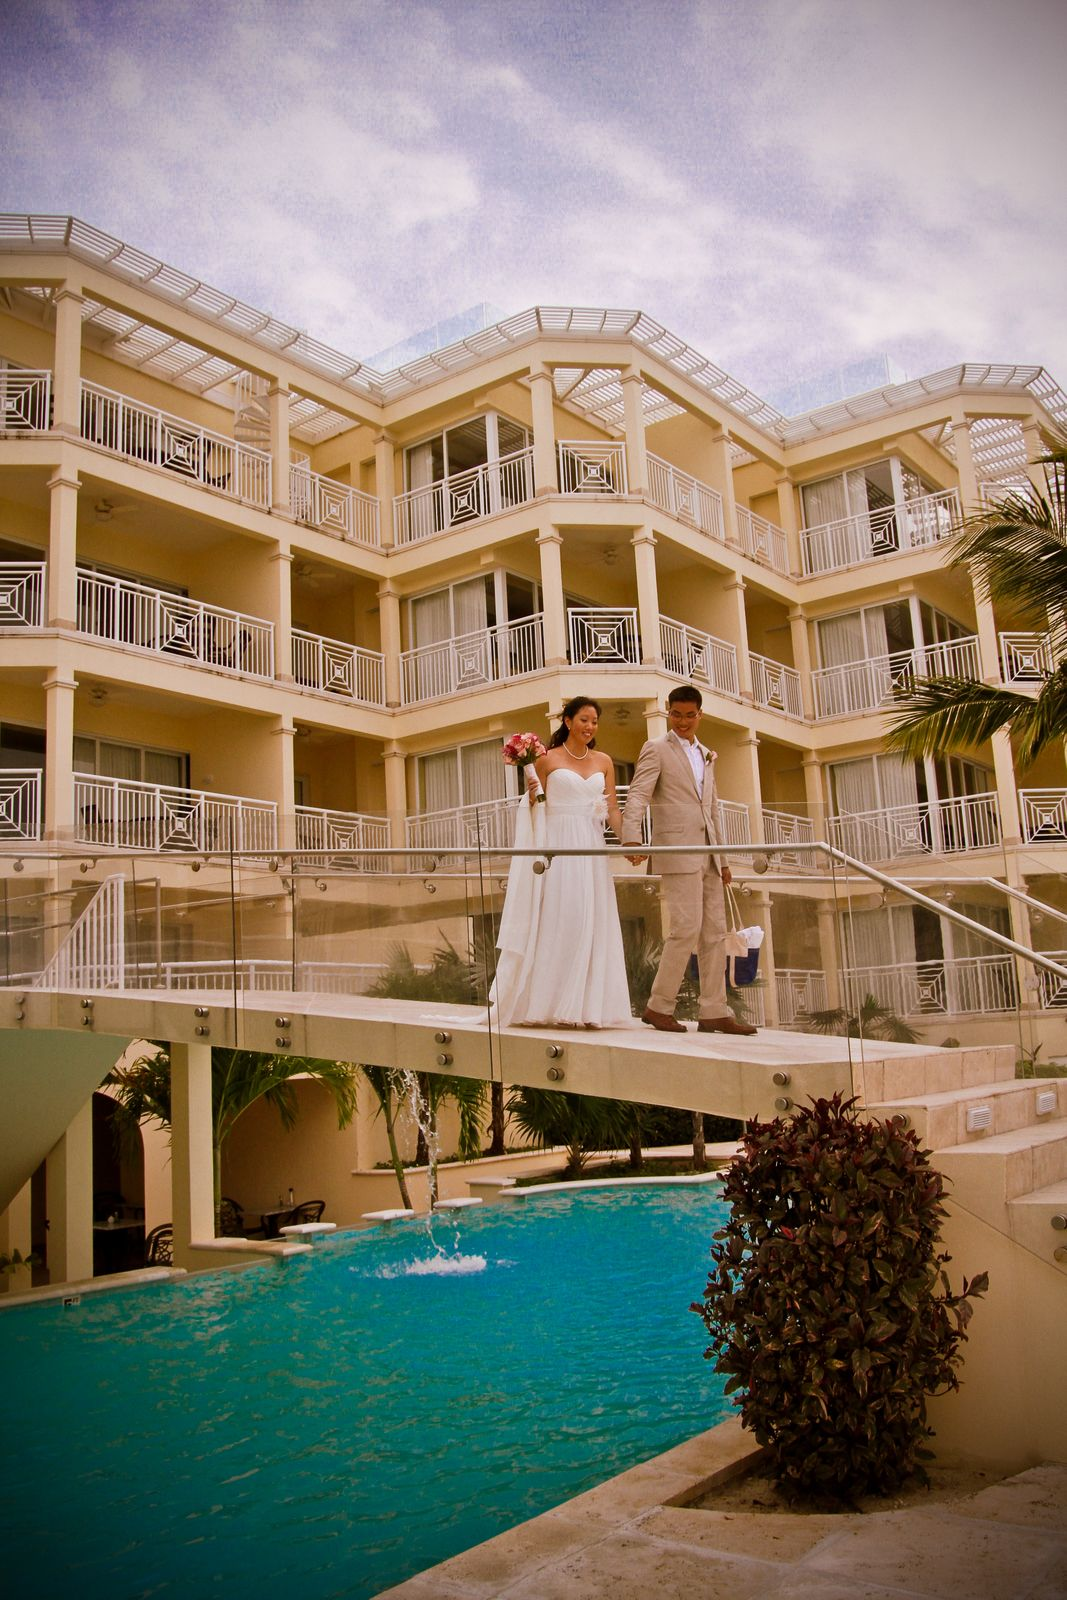 #DestinationWeddings #TurksandCaicos #SevenStars #gansevoort #BeachWeddings #GraceBay #TurksandCaicosPhotographers #TurksandCaicosPhotography #TurksandCaicos #Weddings, © Dianna Hart Photography 2015  www.DiannaHart.com